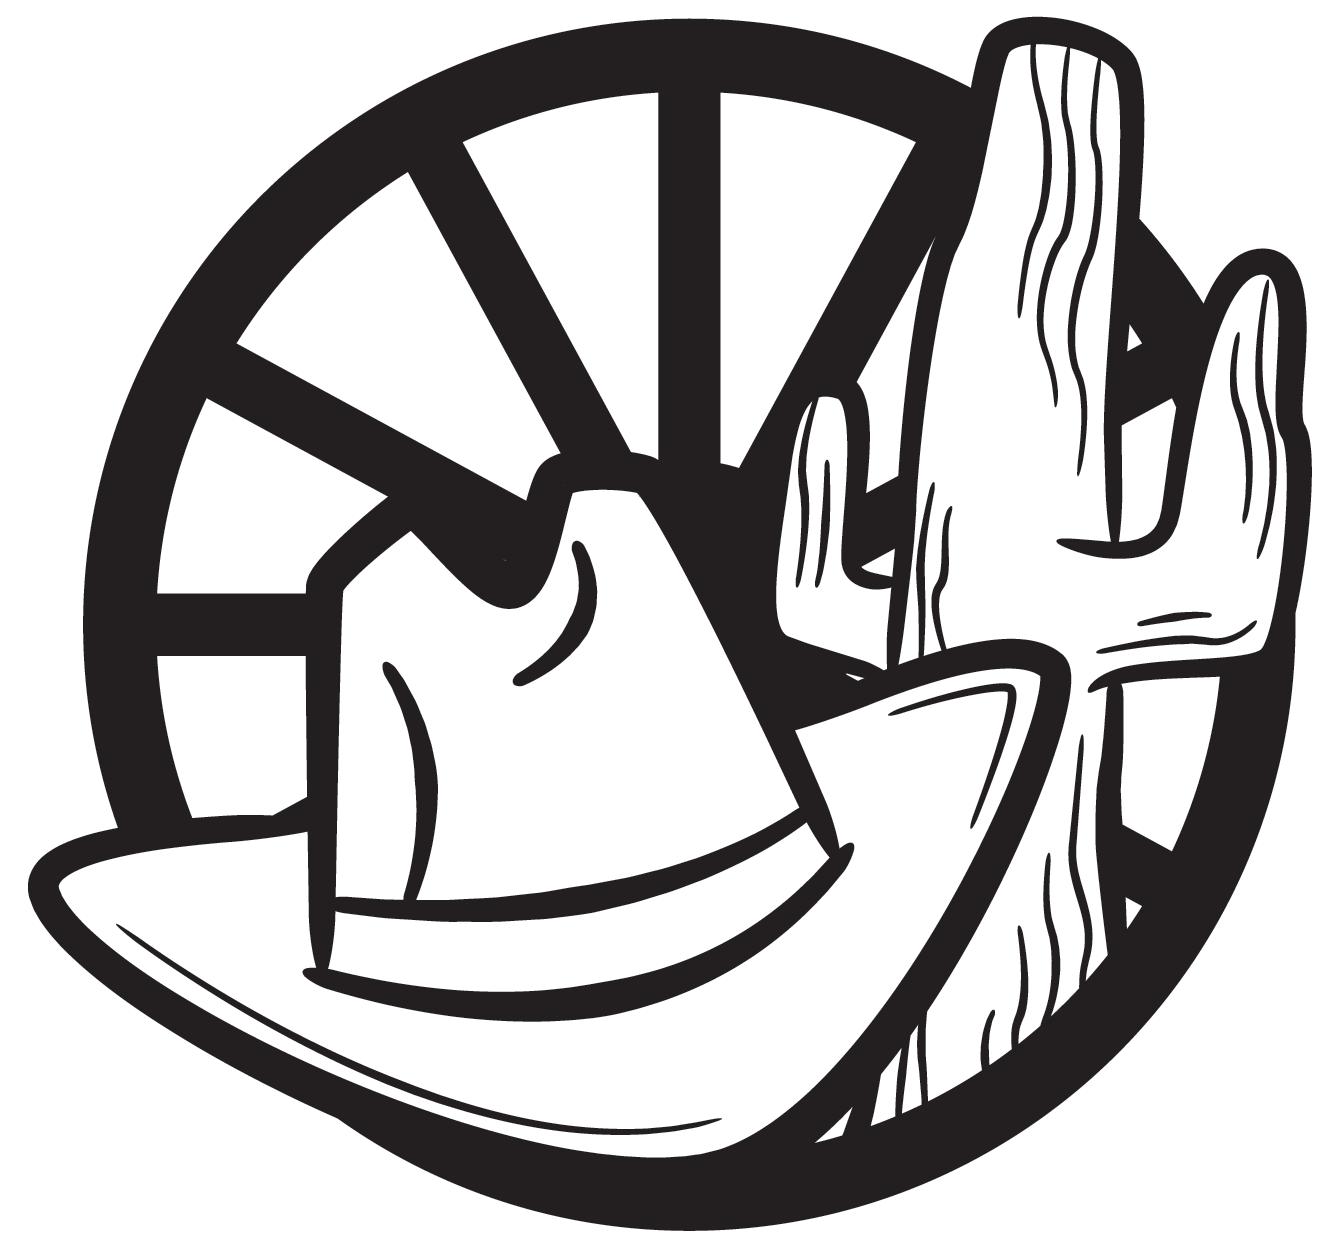 Recorded Books - Logos jpg black and white